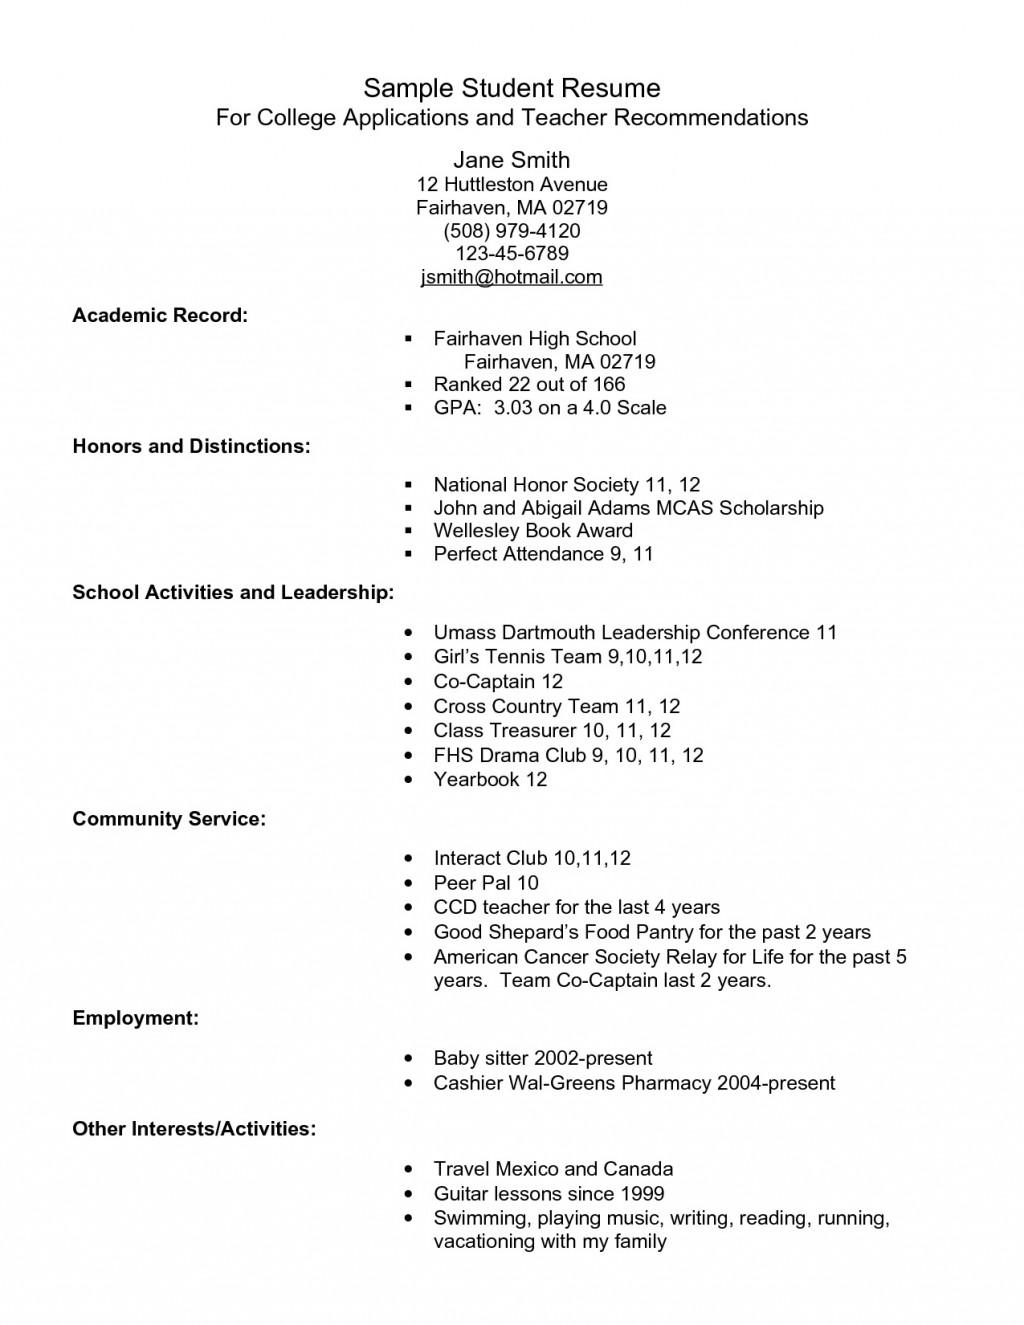 004 Impressive College Admission Resume Template Photo  Microsoft Word Application DownloadLarge